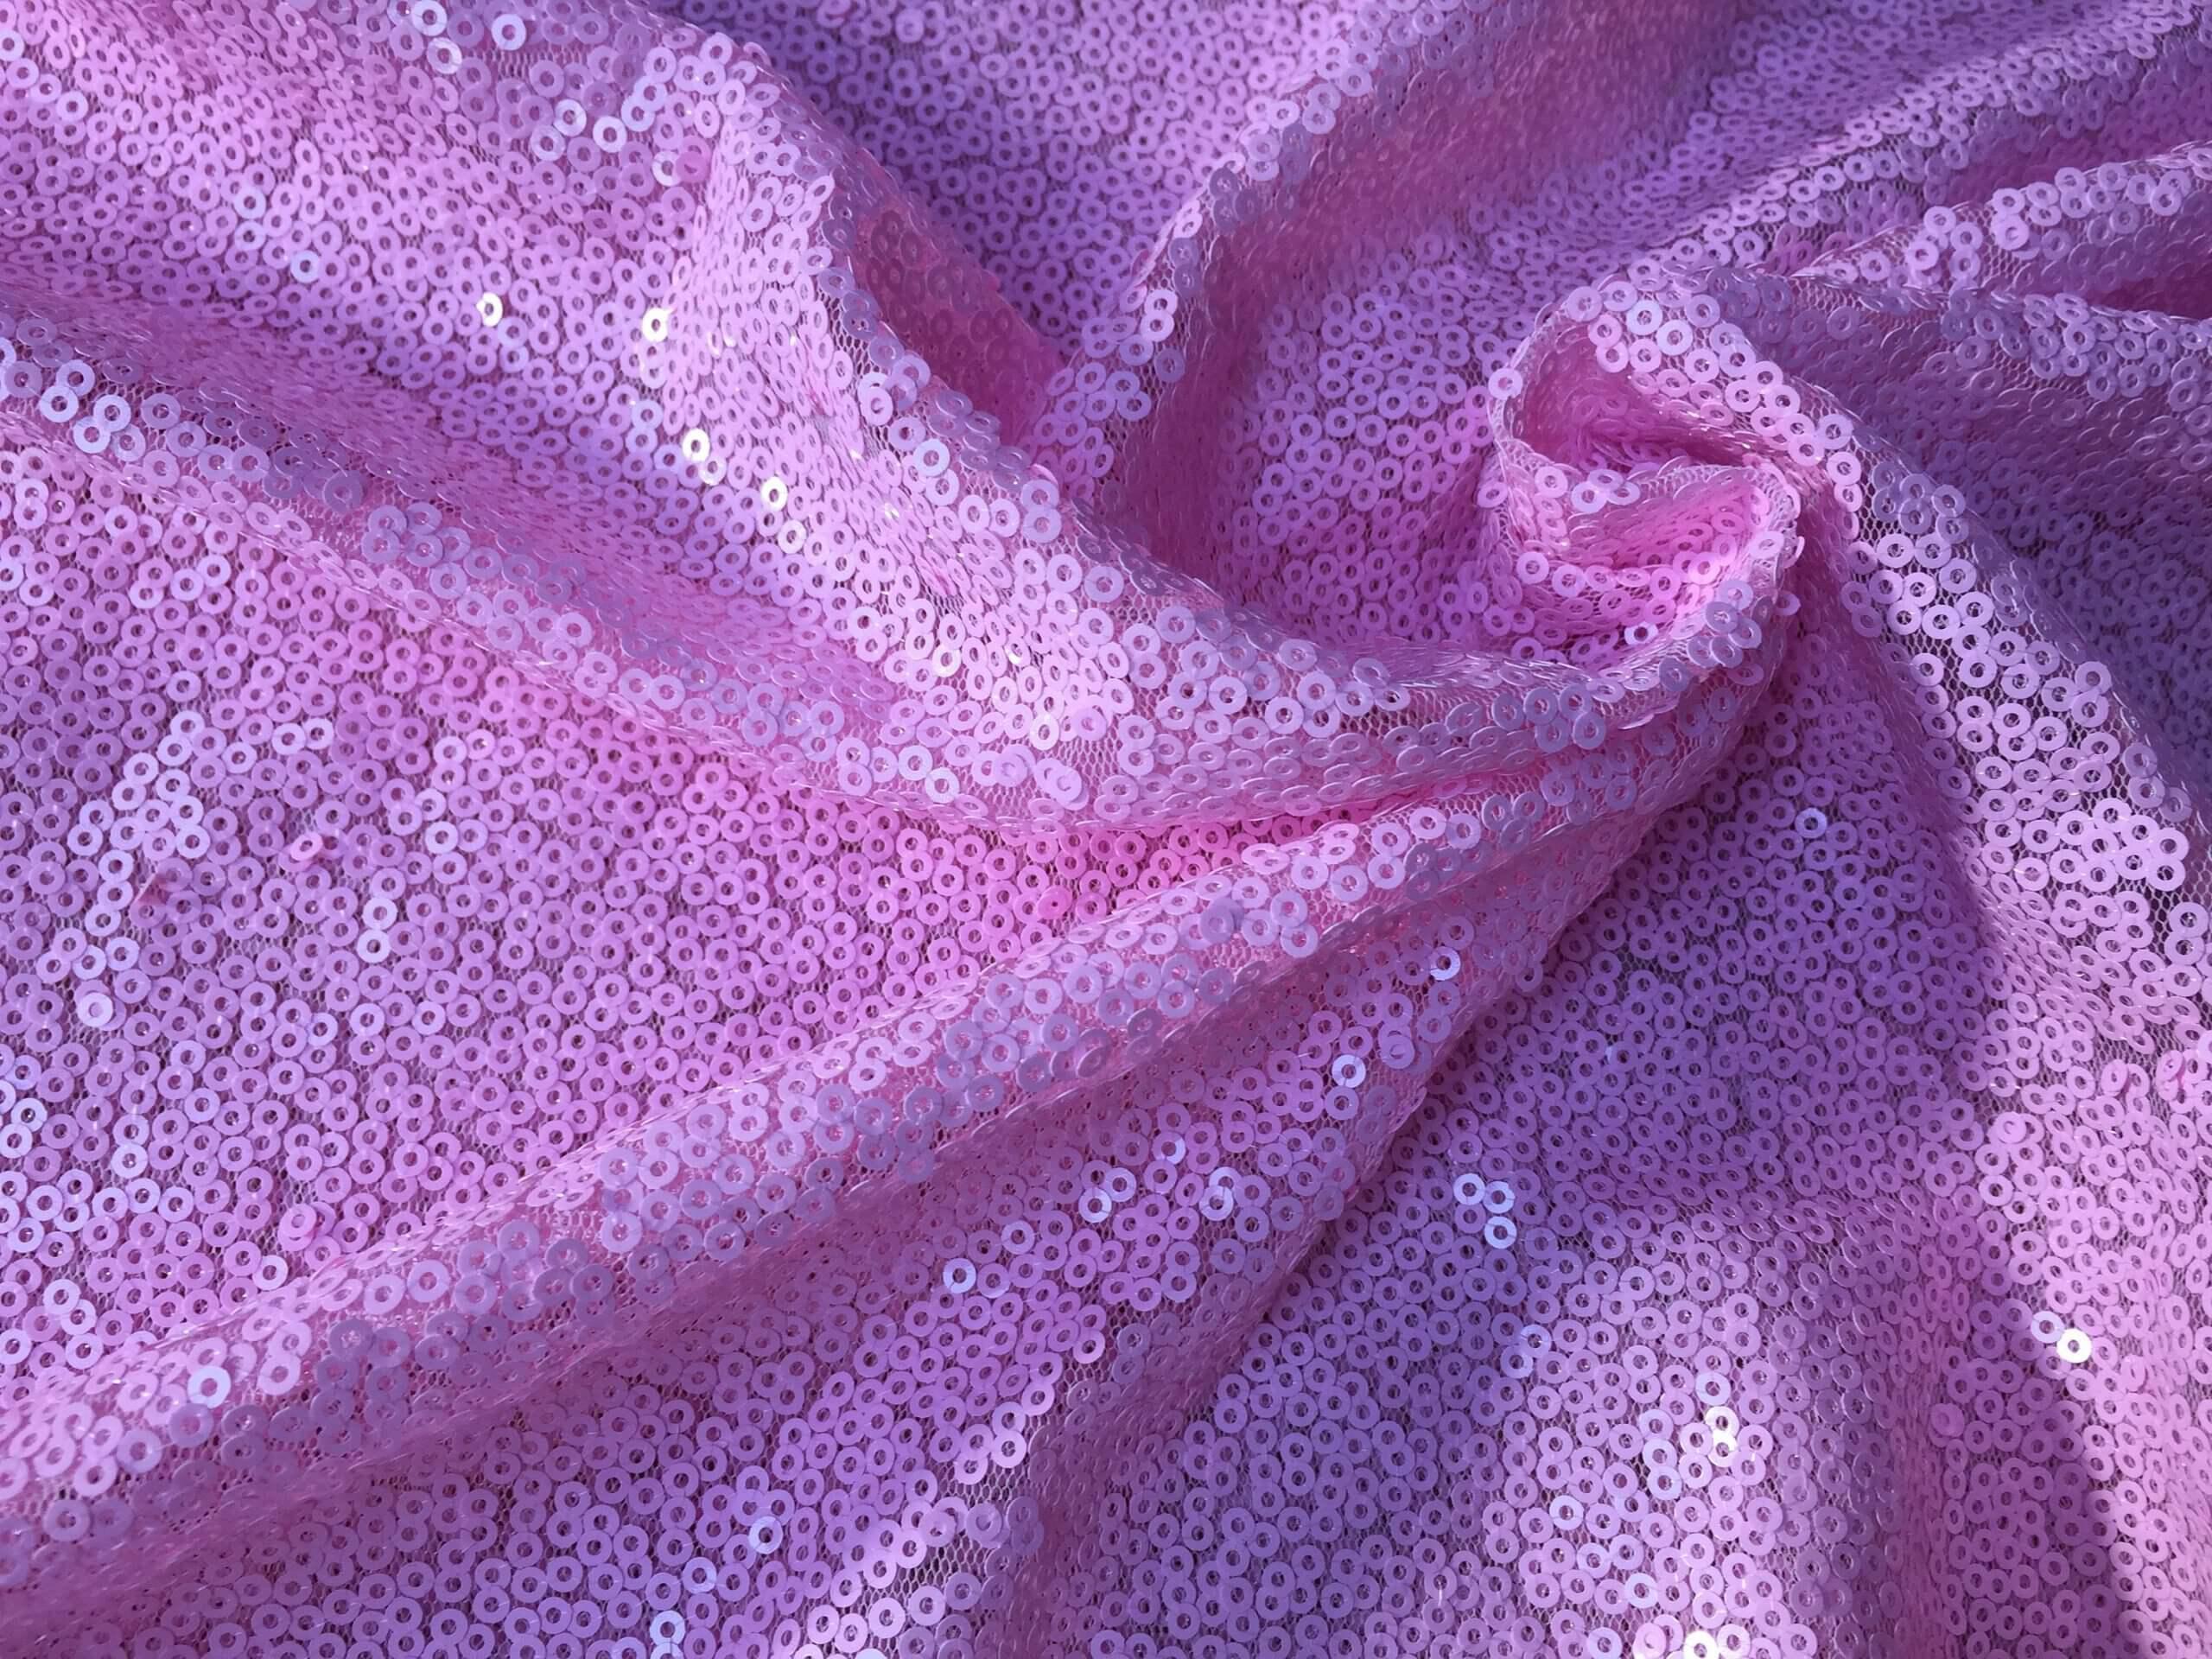 3mm-sequin-fabric-material-sparkling-glitter-sequins-47-120cm-wide-matte-pink-paillettes-5de69b611.jpg